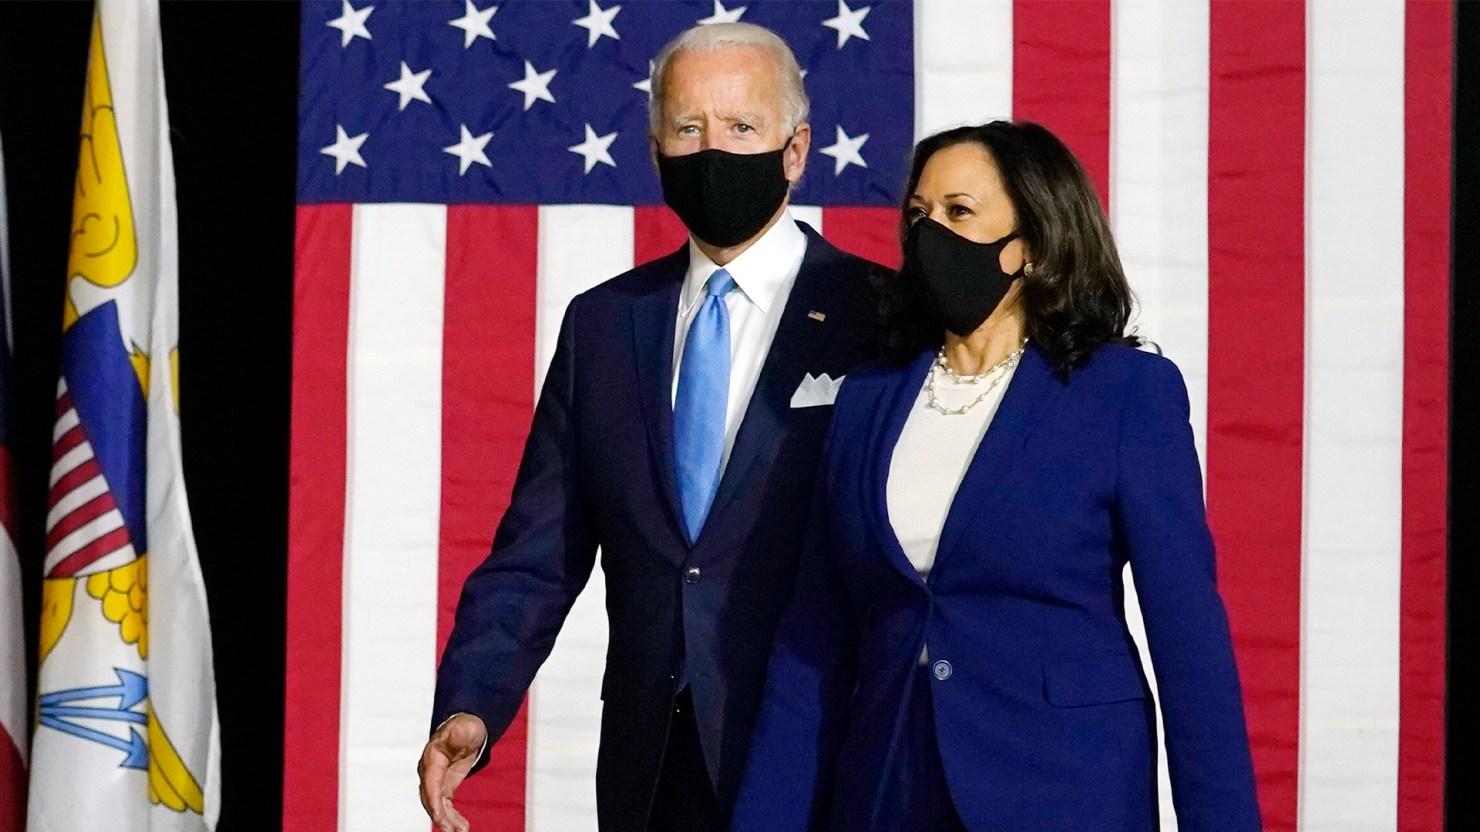 Joe Biden Becomes The 46th American President